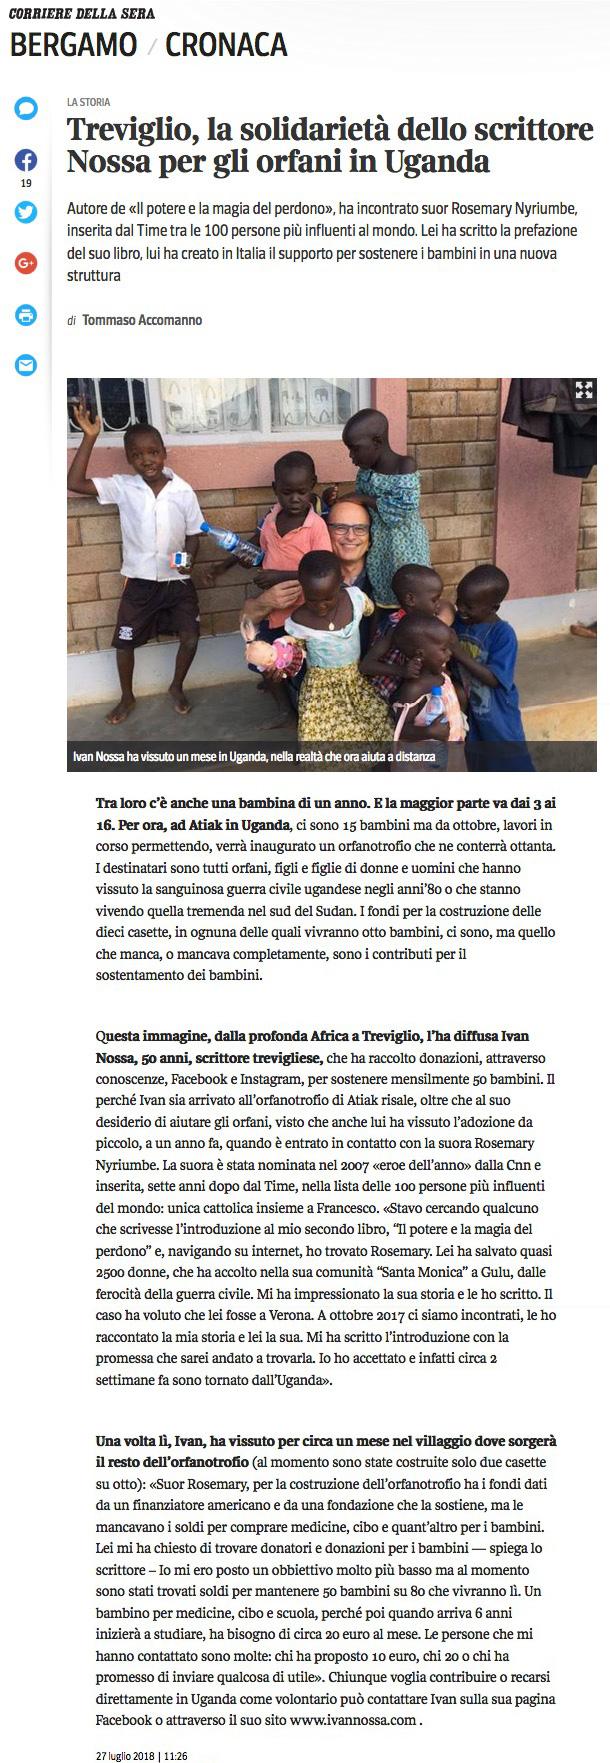 corriere-bergamo-ivan-nossa-orfanotrofio-atiak-uganda-suor-rosemary